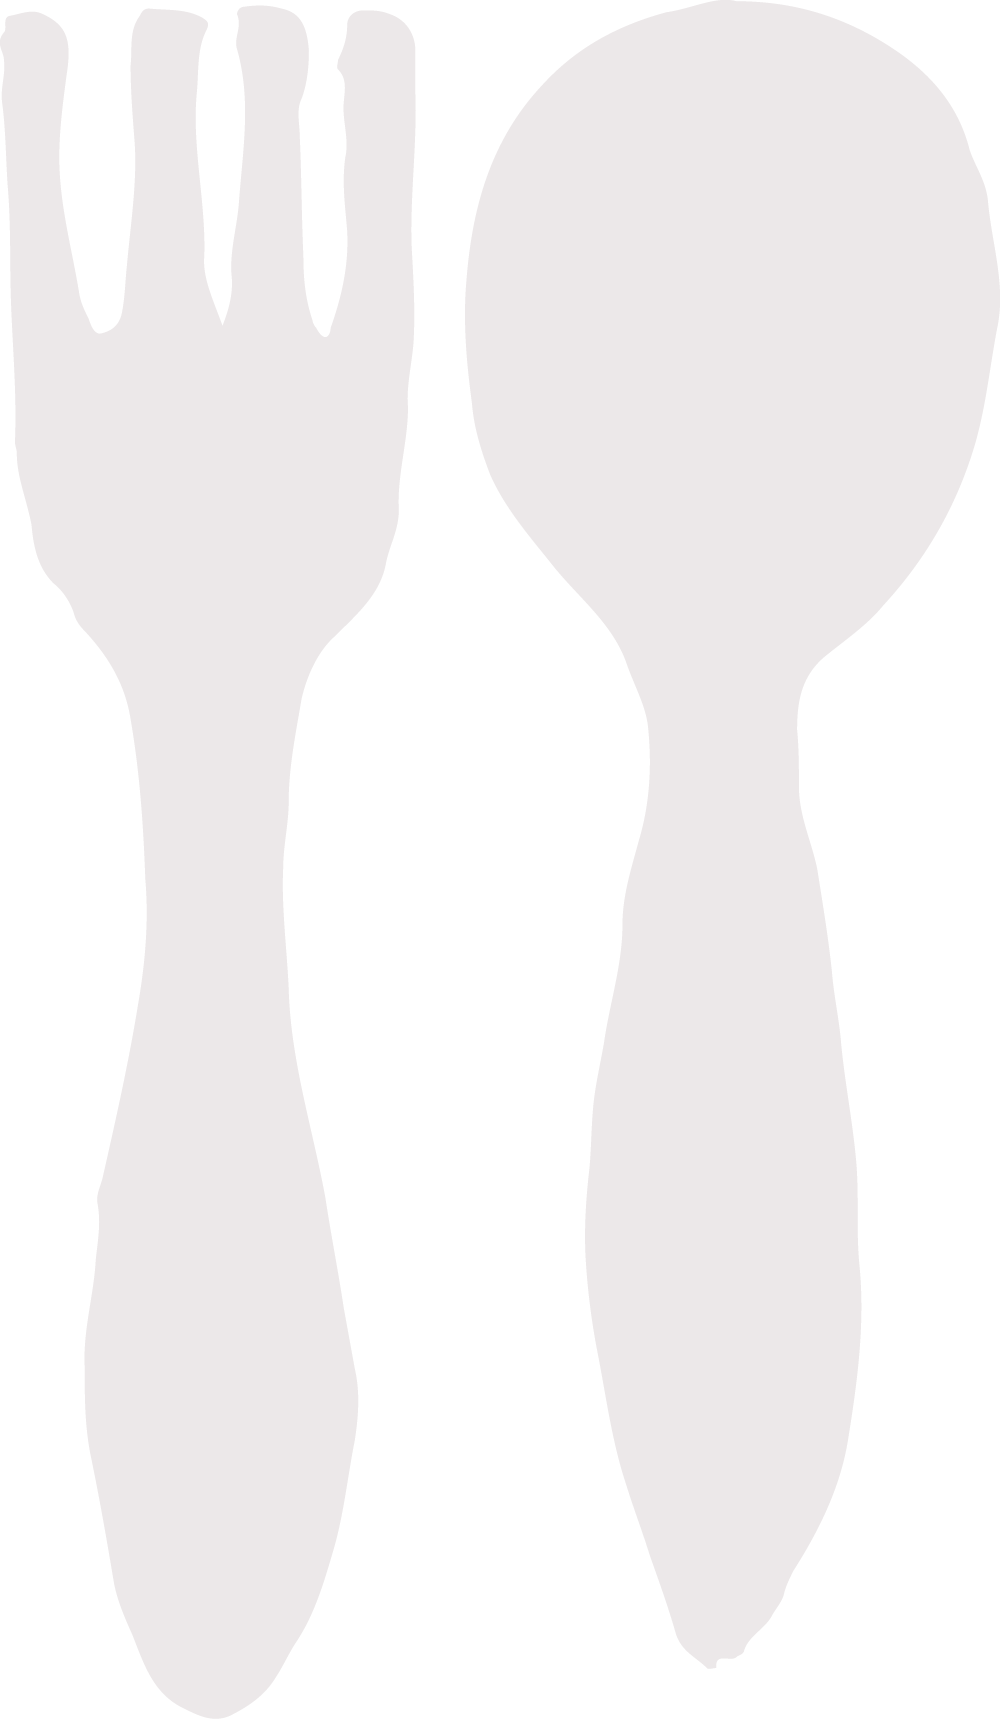 utensils.png